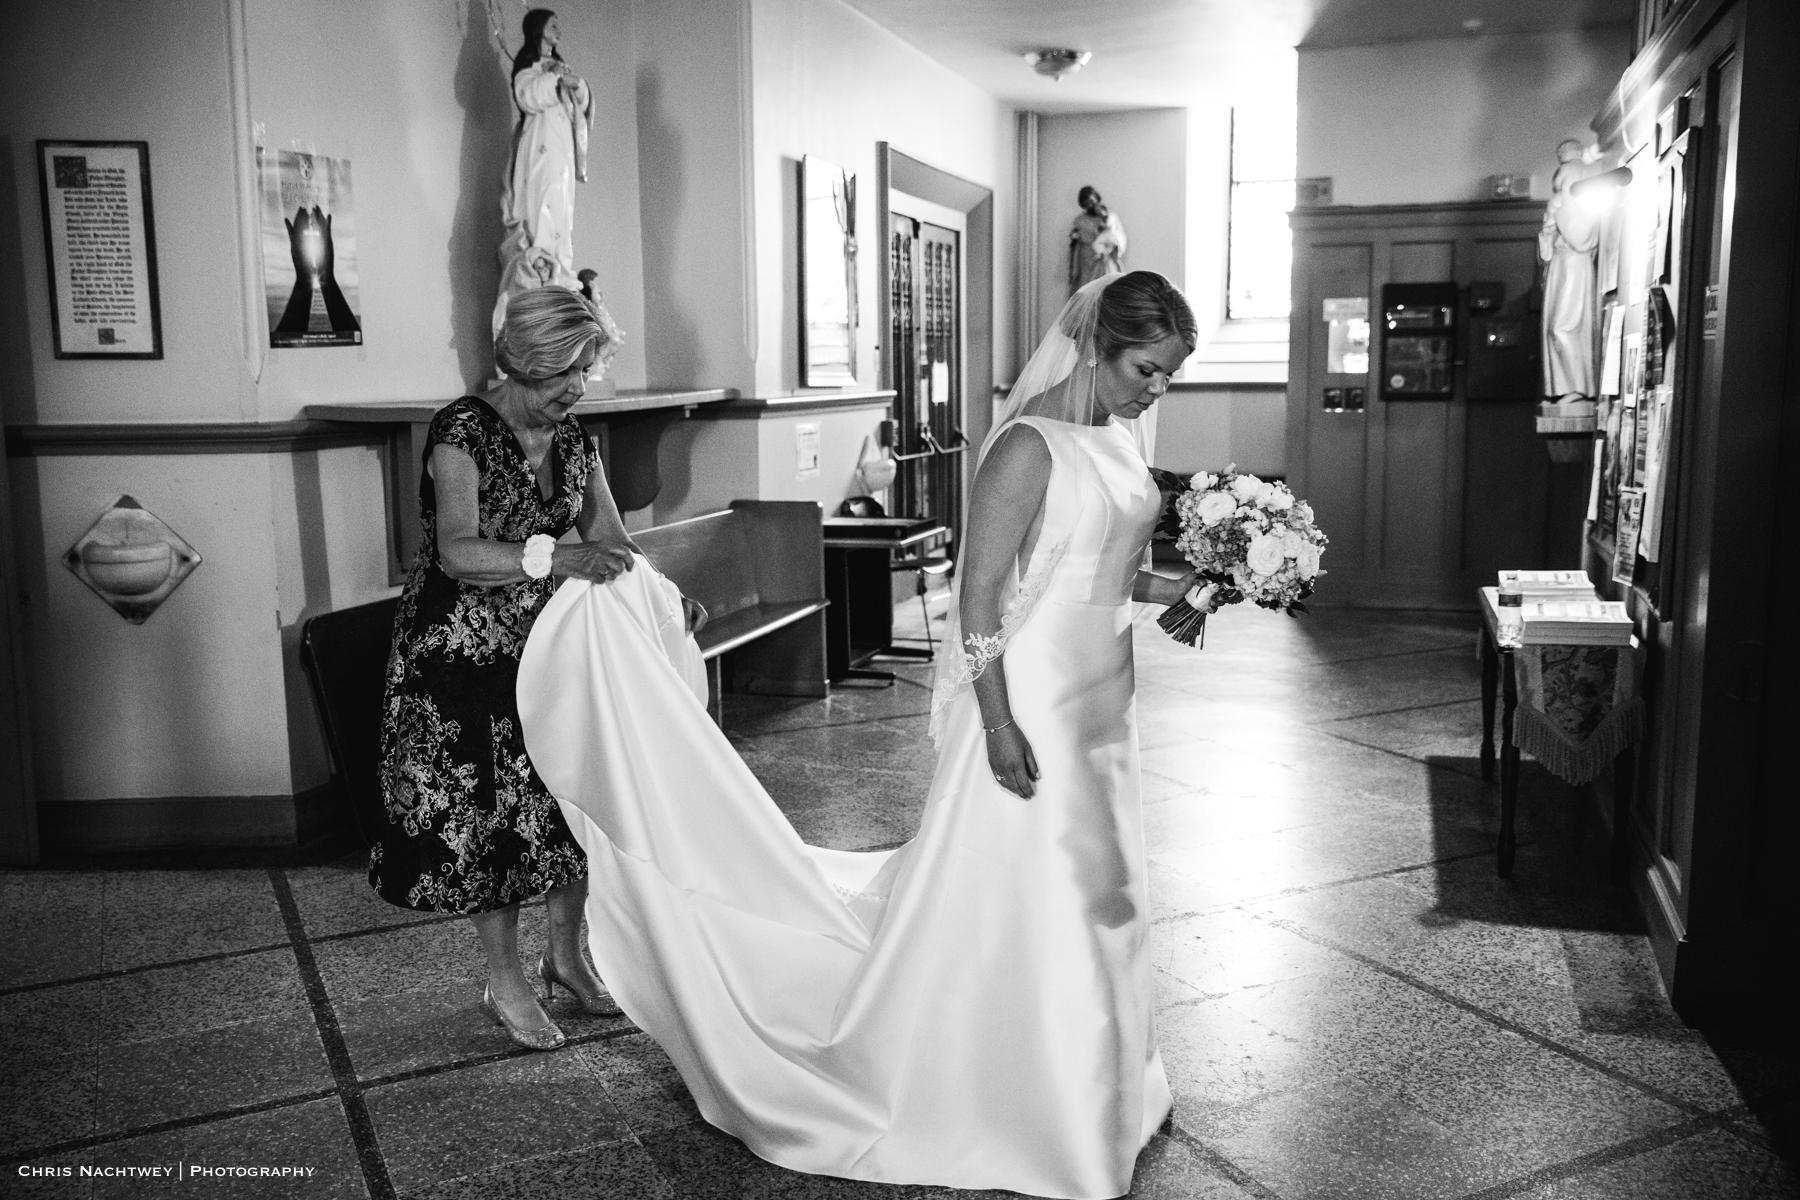 photos-wedding-haley-mansion-mystic-ct-chris-nachtwey-photography-2019-10.jpg